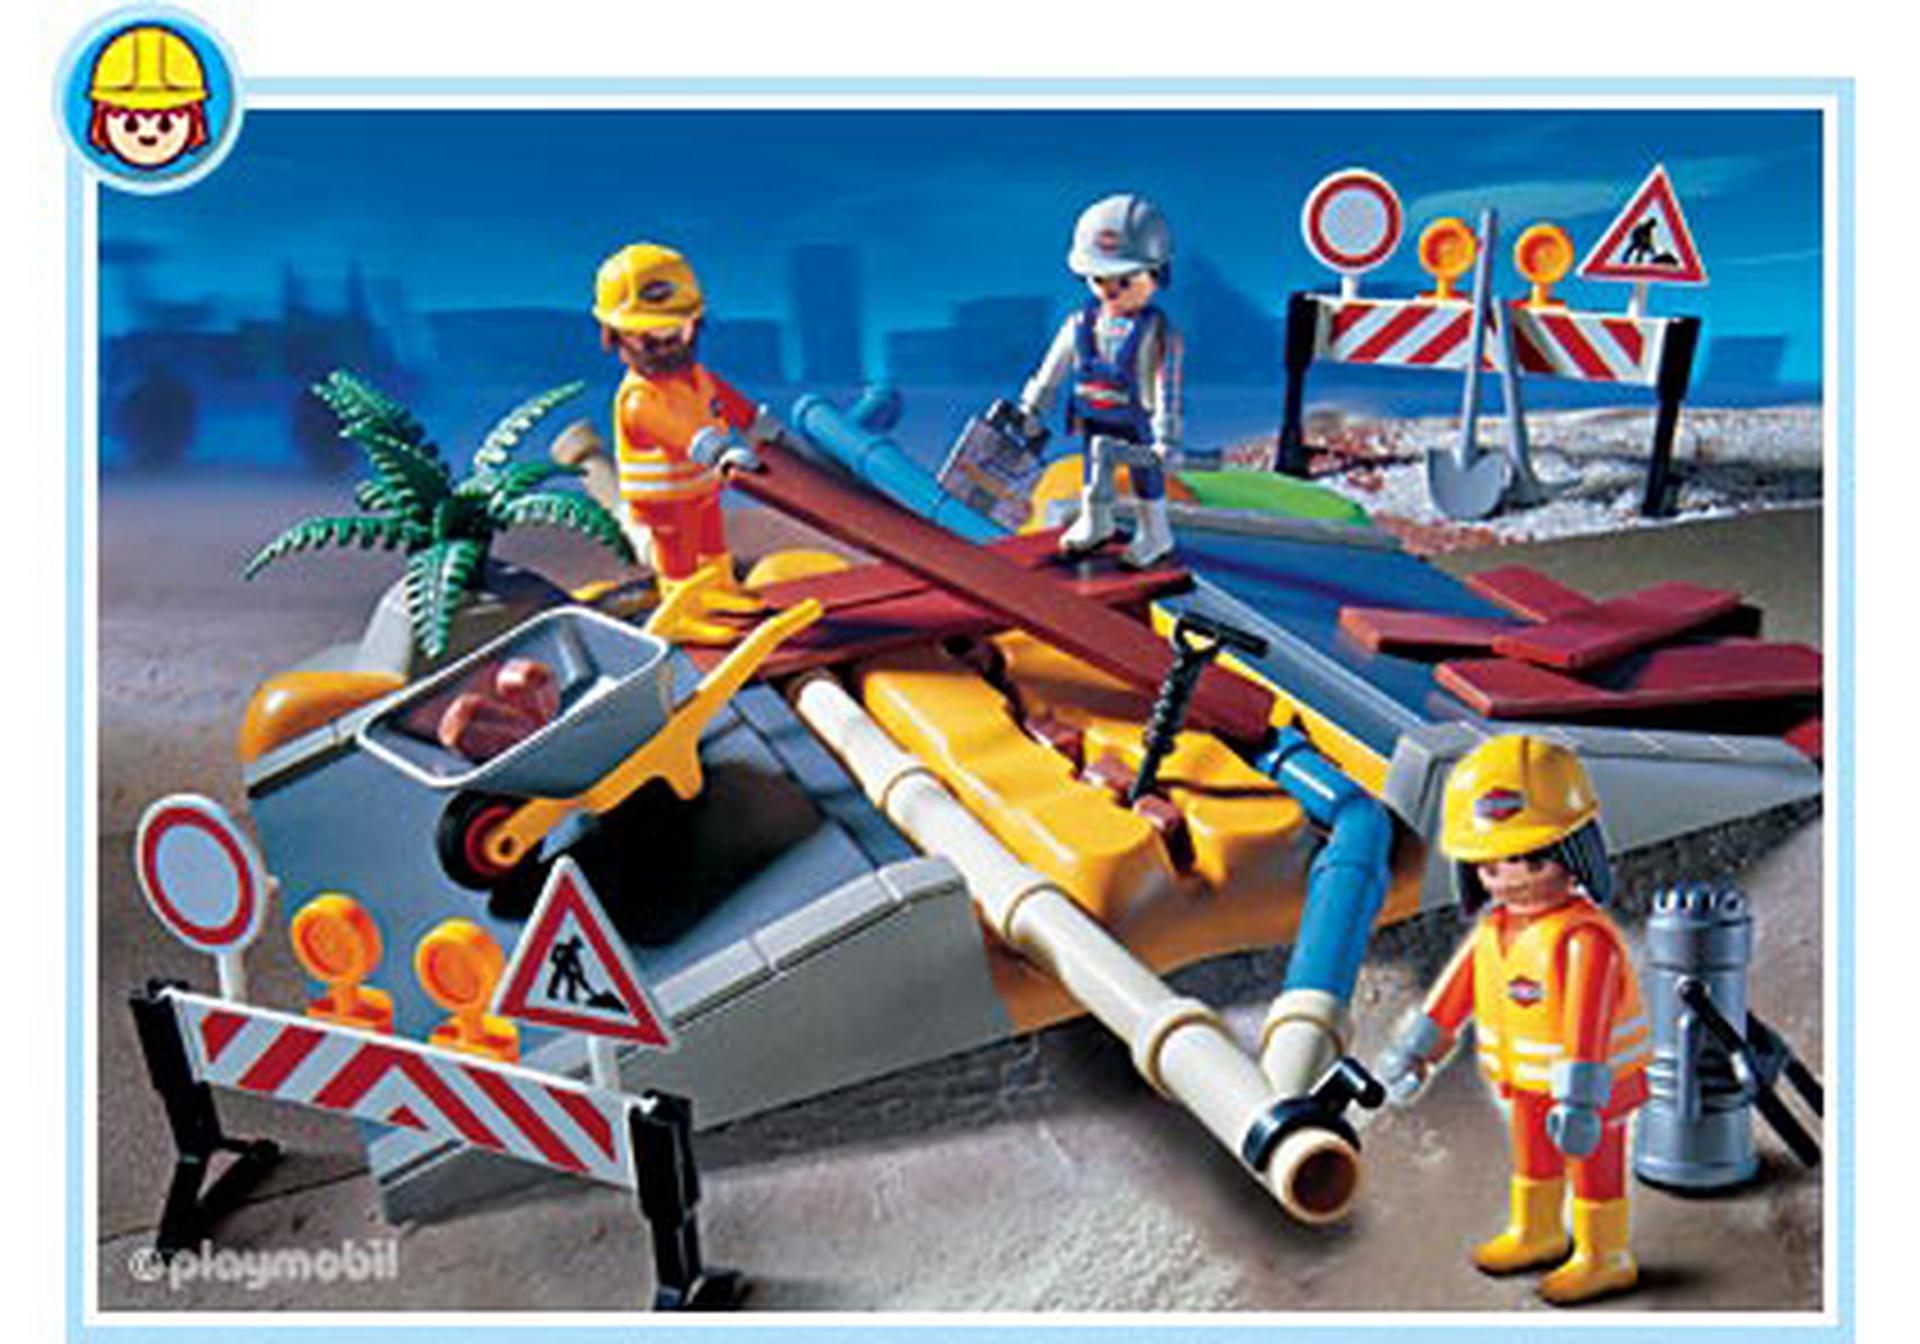 Superset bau 3126 a playmobil deutschland for Jugendzimmer playmobil